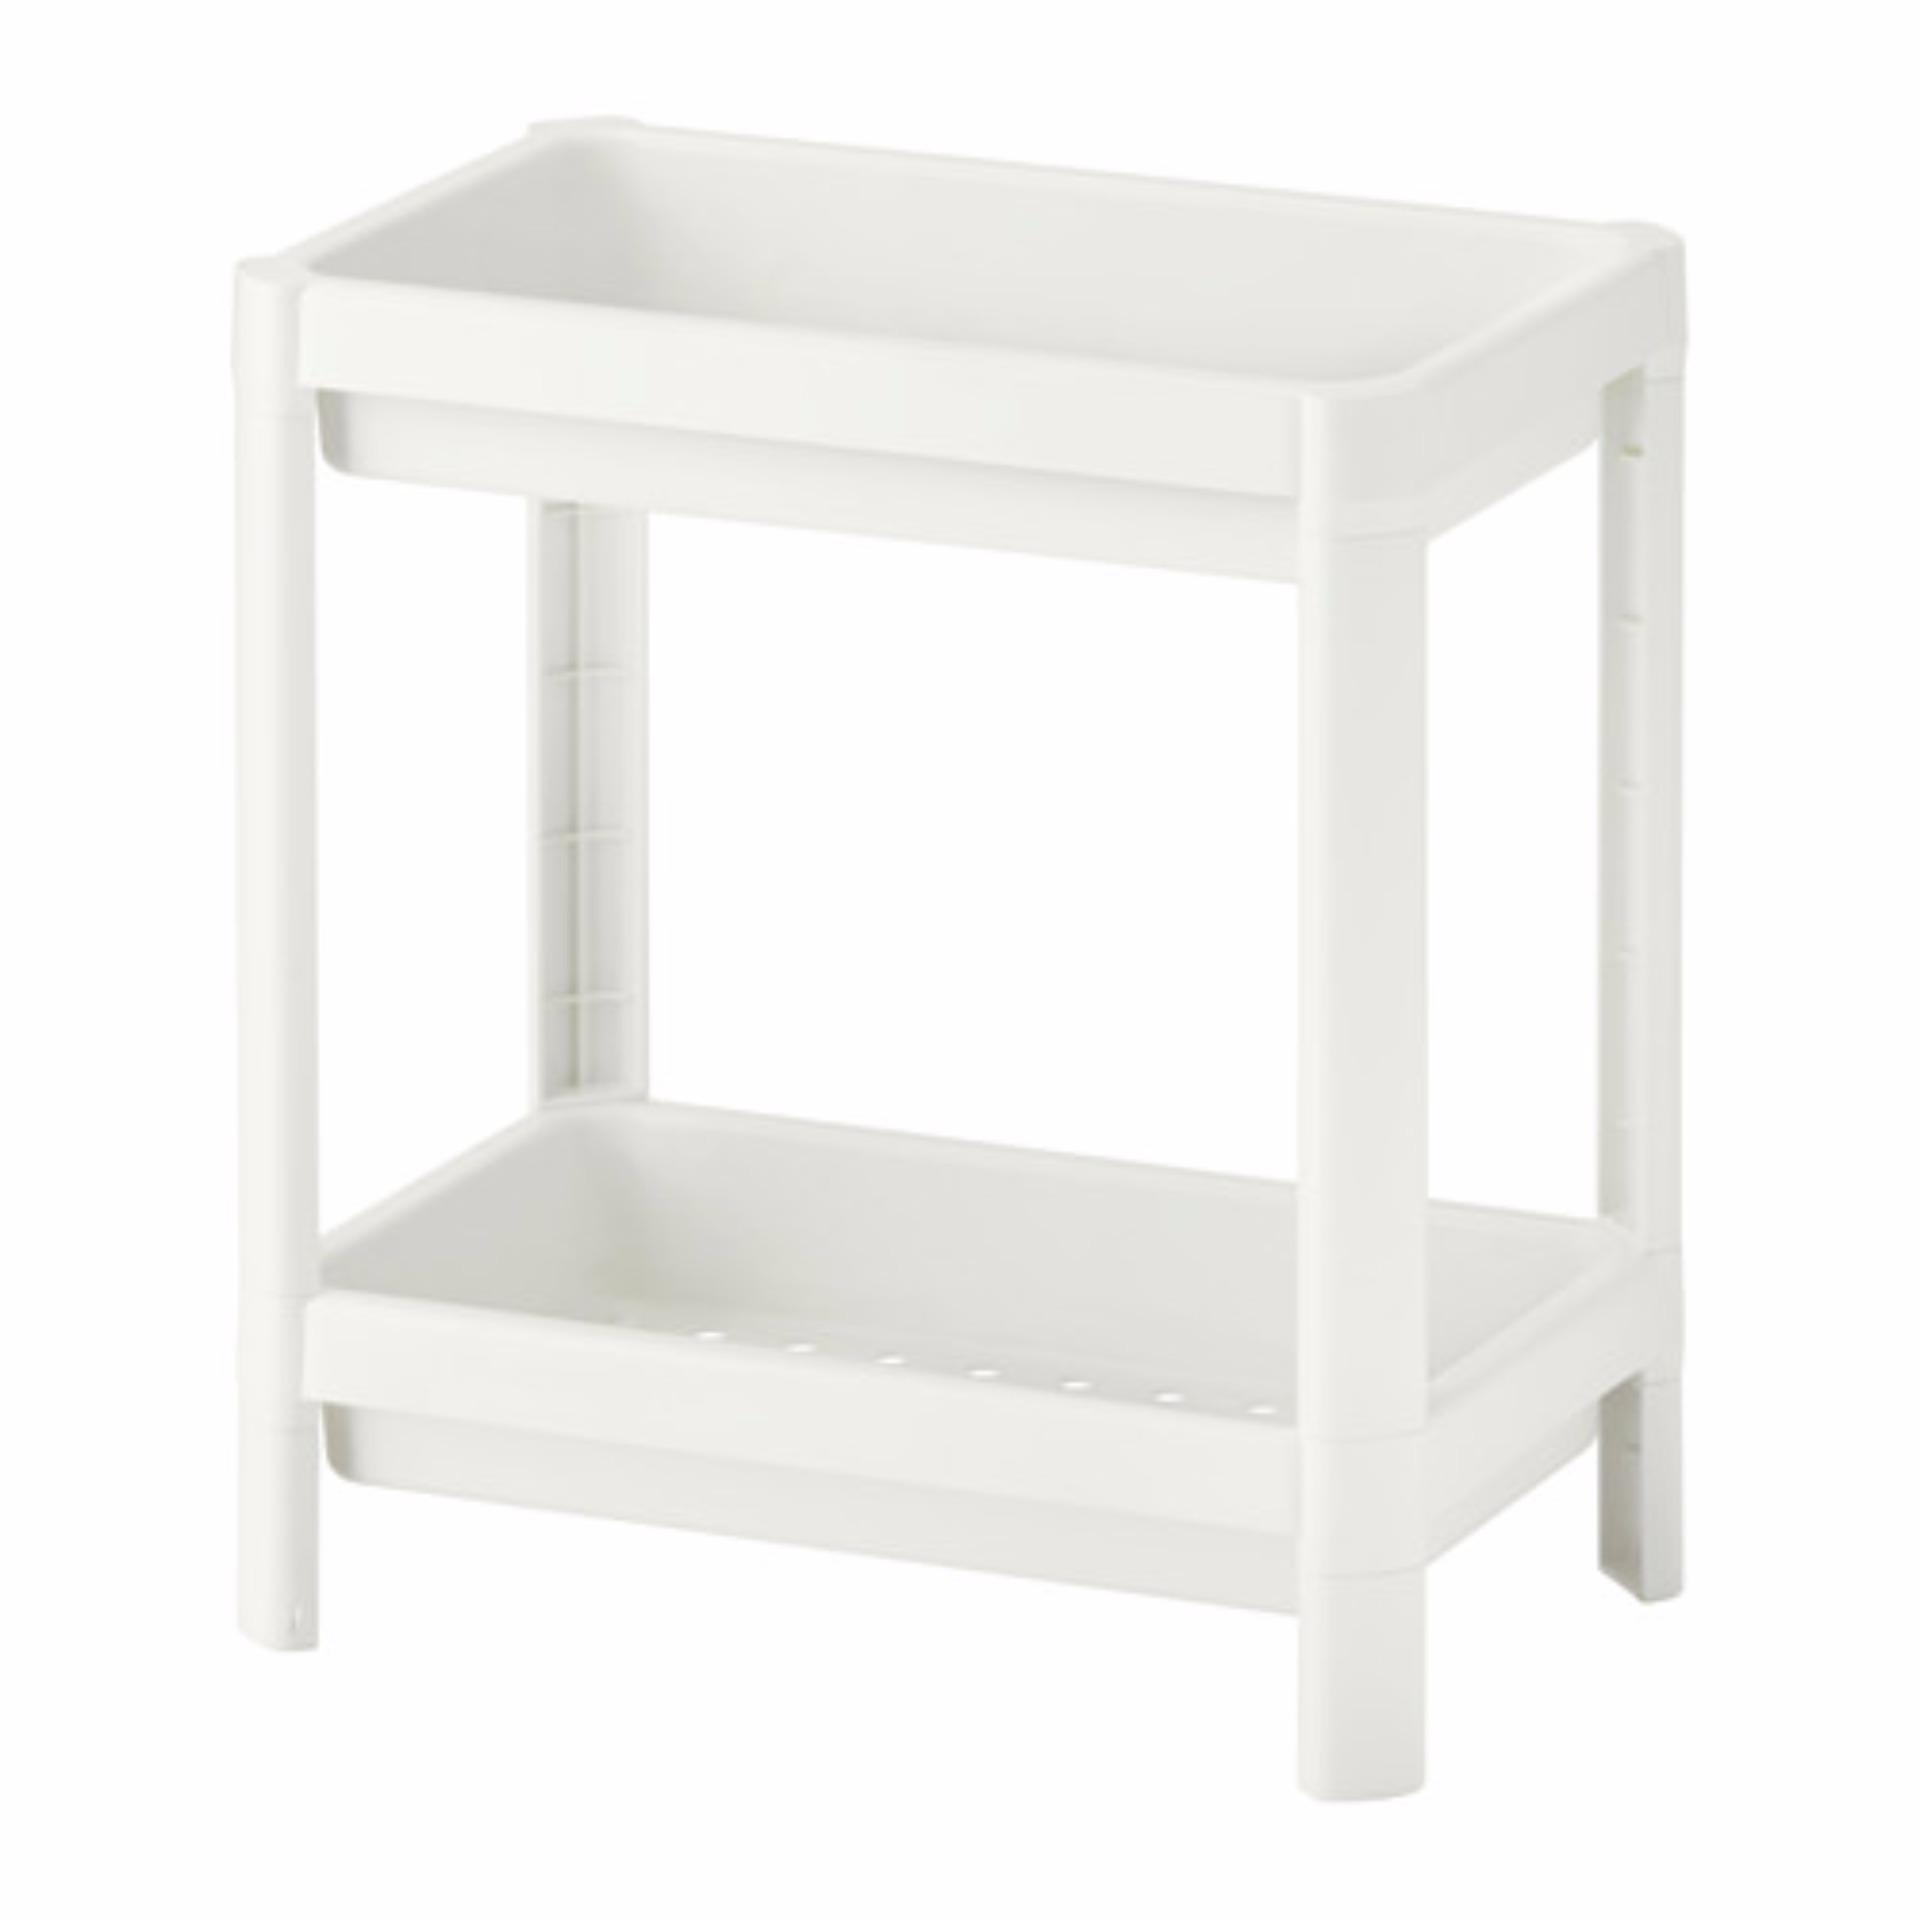 Harga Ikea Vesken Rak Serbaguna 2 Susun Putih Origin